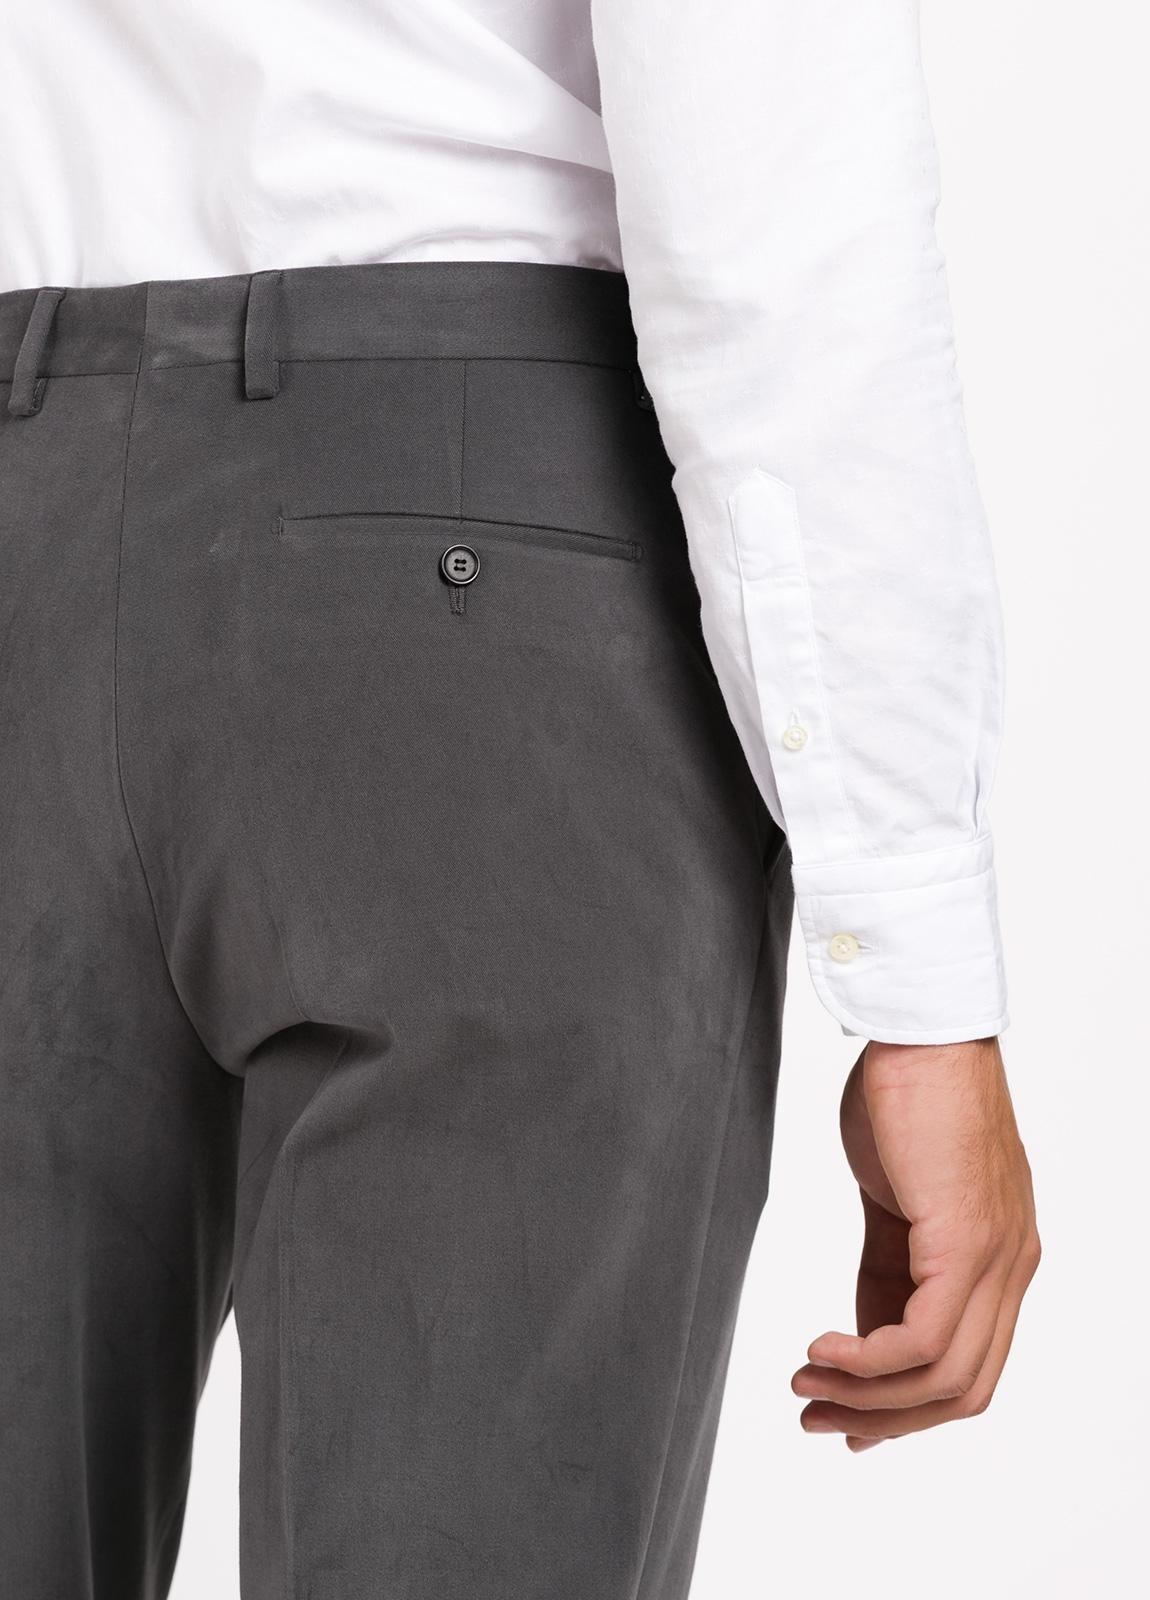 Pantalón vestir de algodón Regular Fit, color gris oscuro. 98% Algodón, 2% Ea. - Ítem2